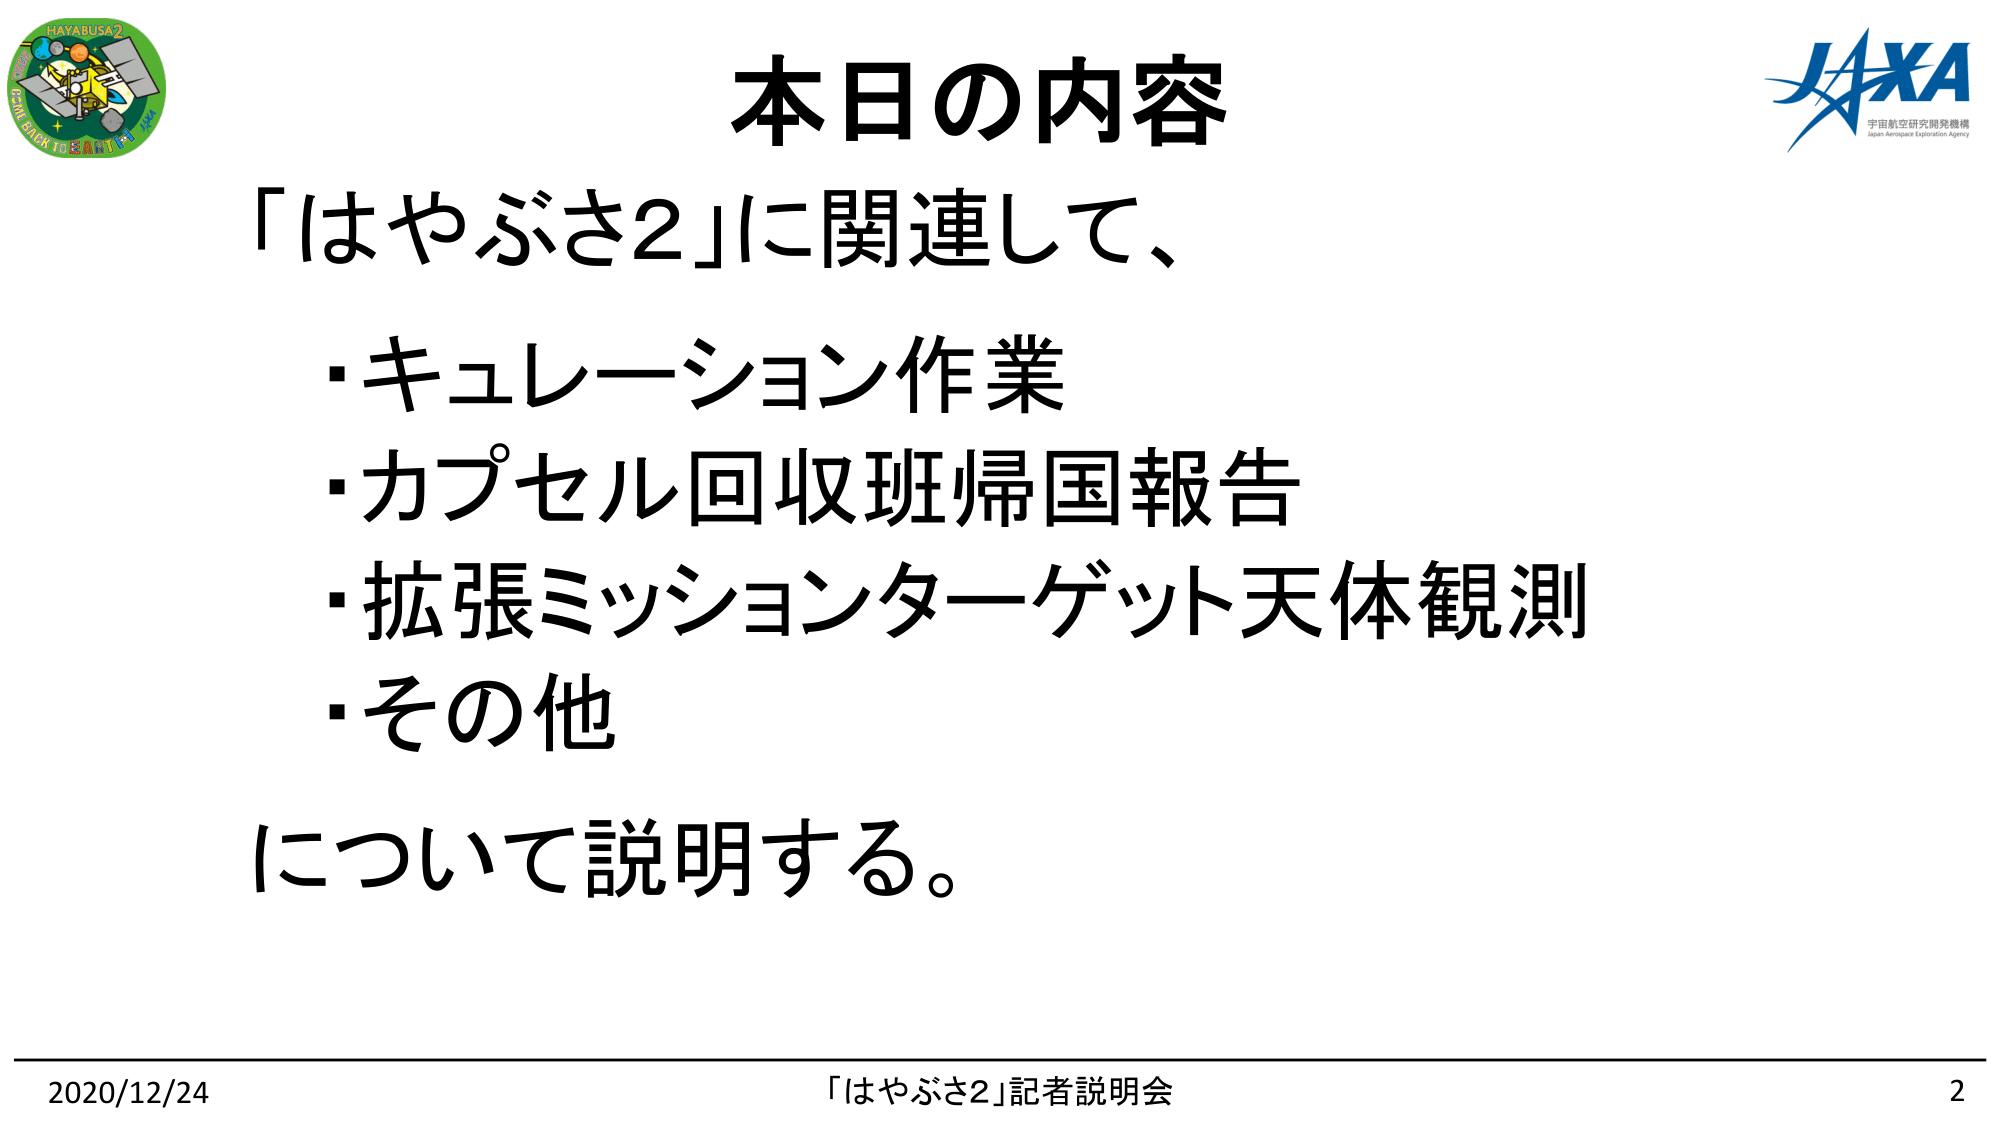 f:id:Imamura:20201224134945p:image